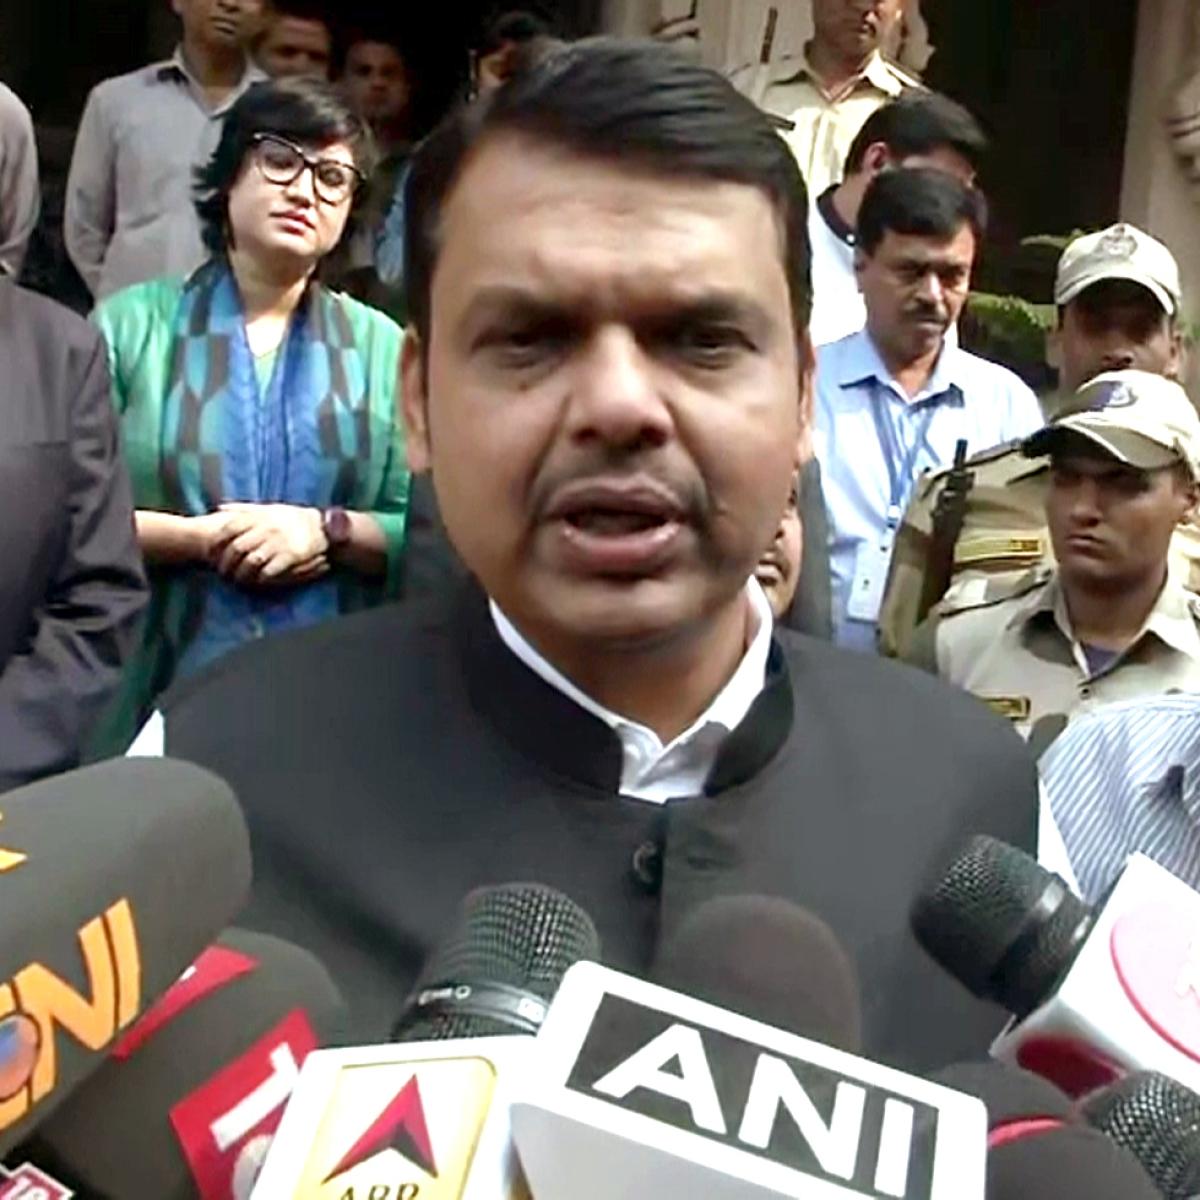 HC dismisses plea challenging Fadnavis' election; Rs 2 lakh fine imposed on petitioner